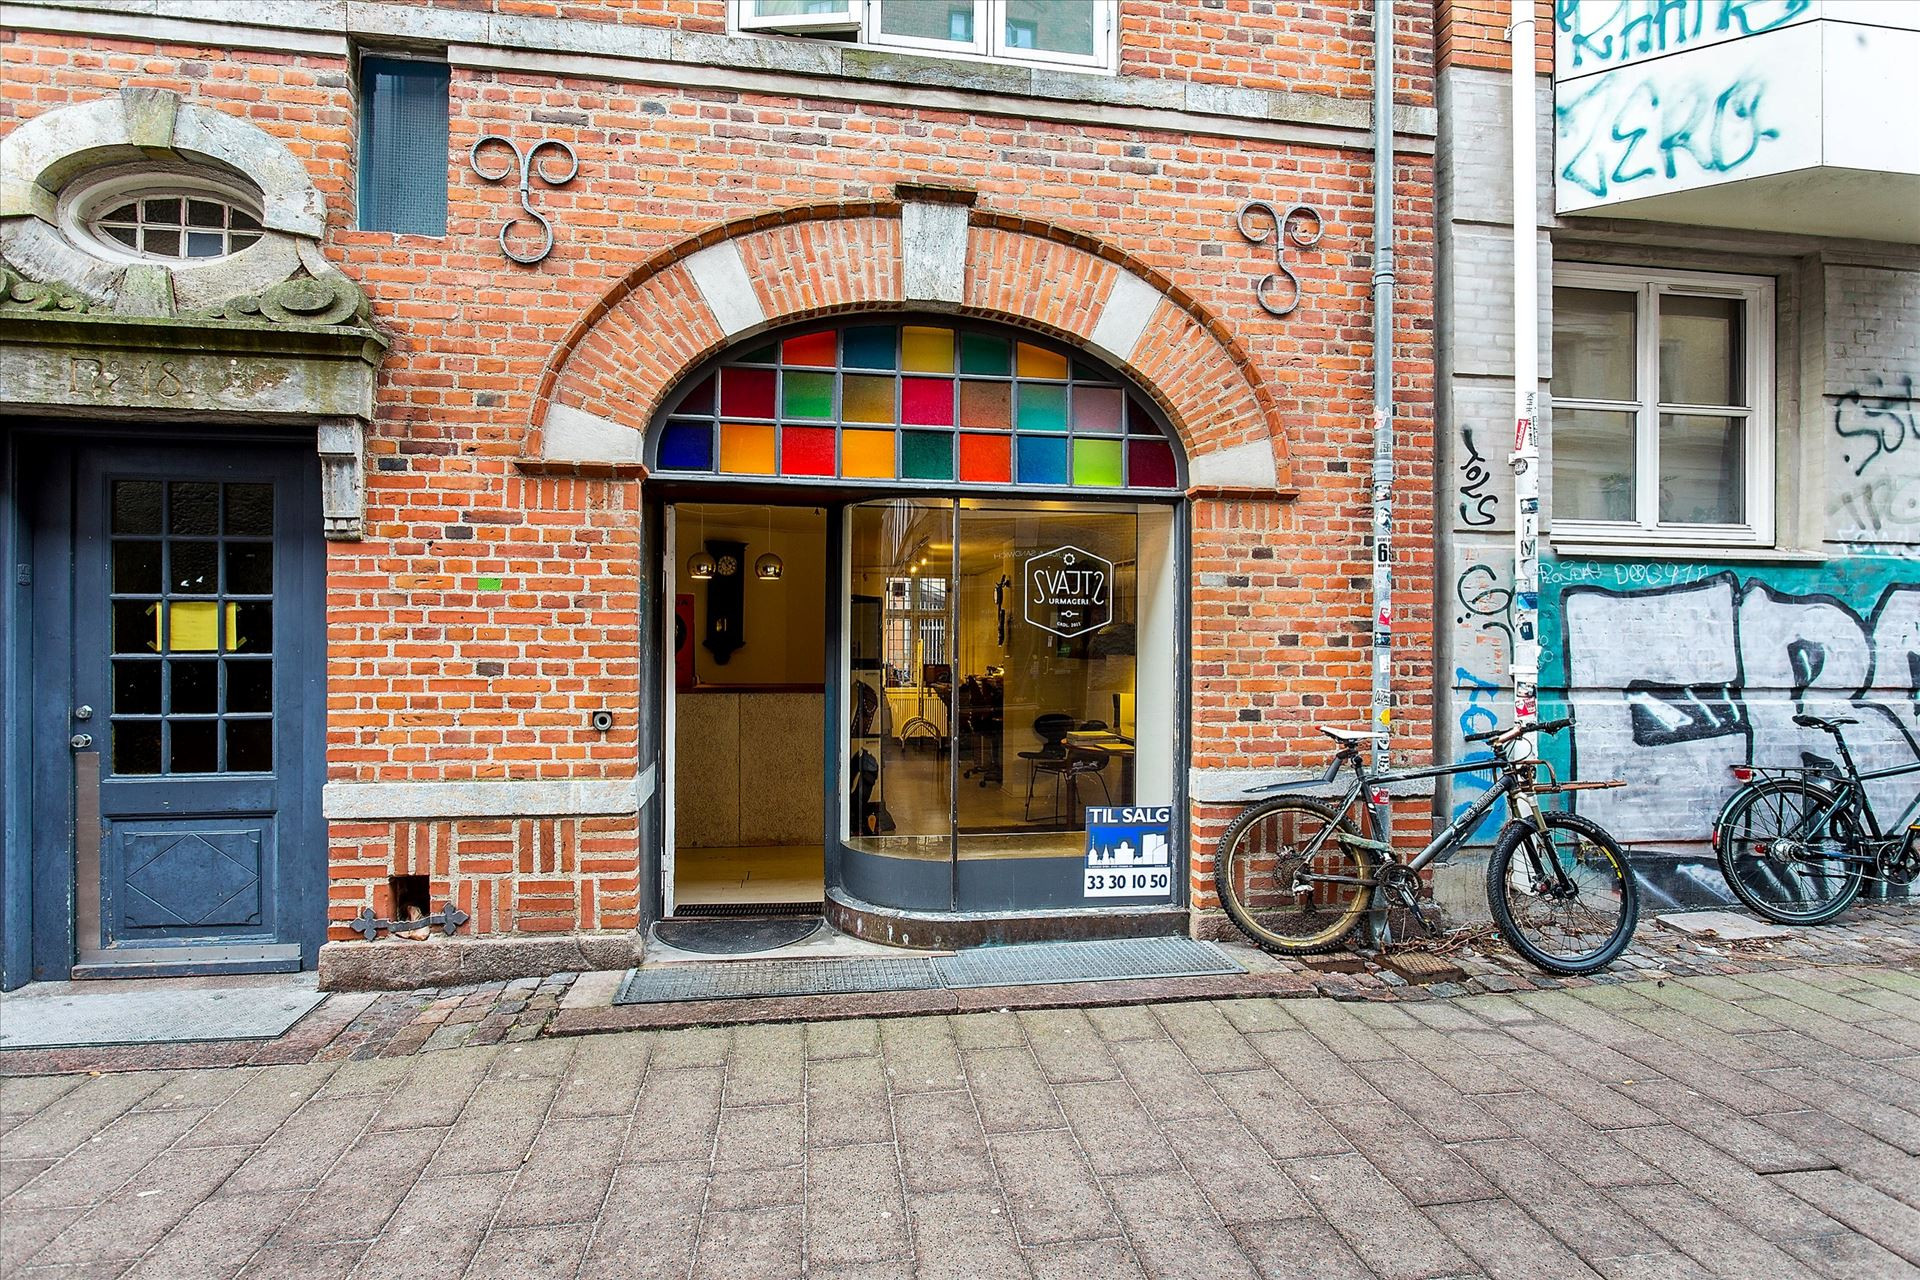 61 m² erhvervsandel – Blågårdsgade